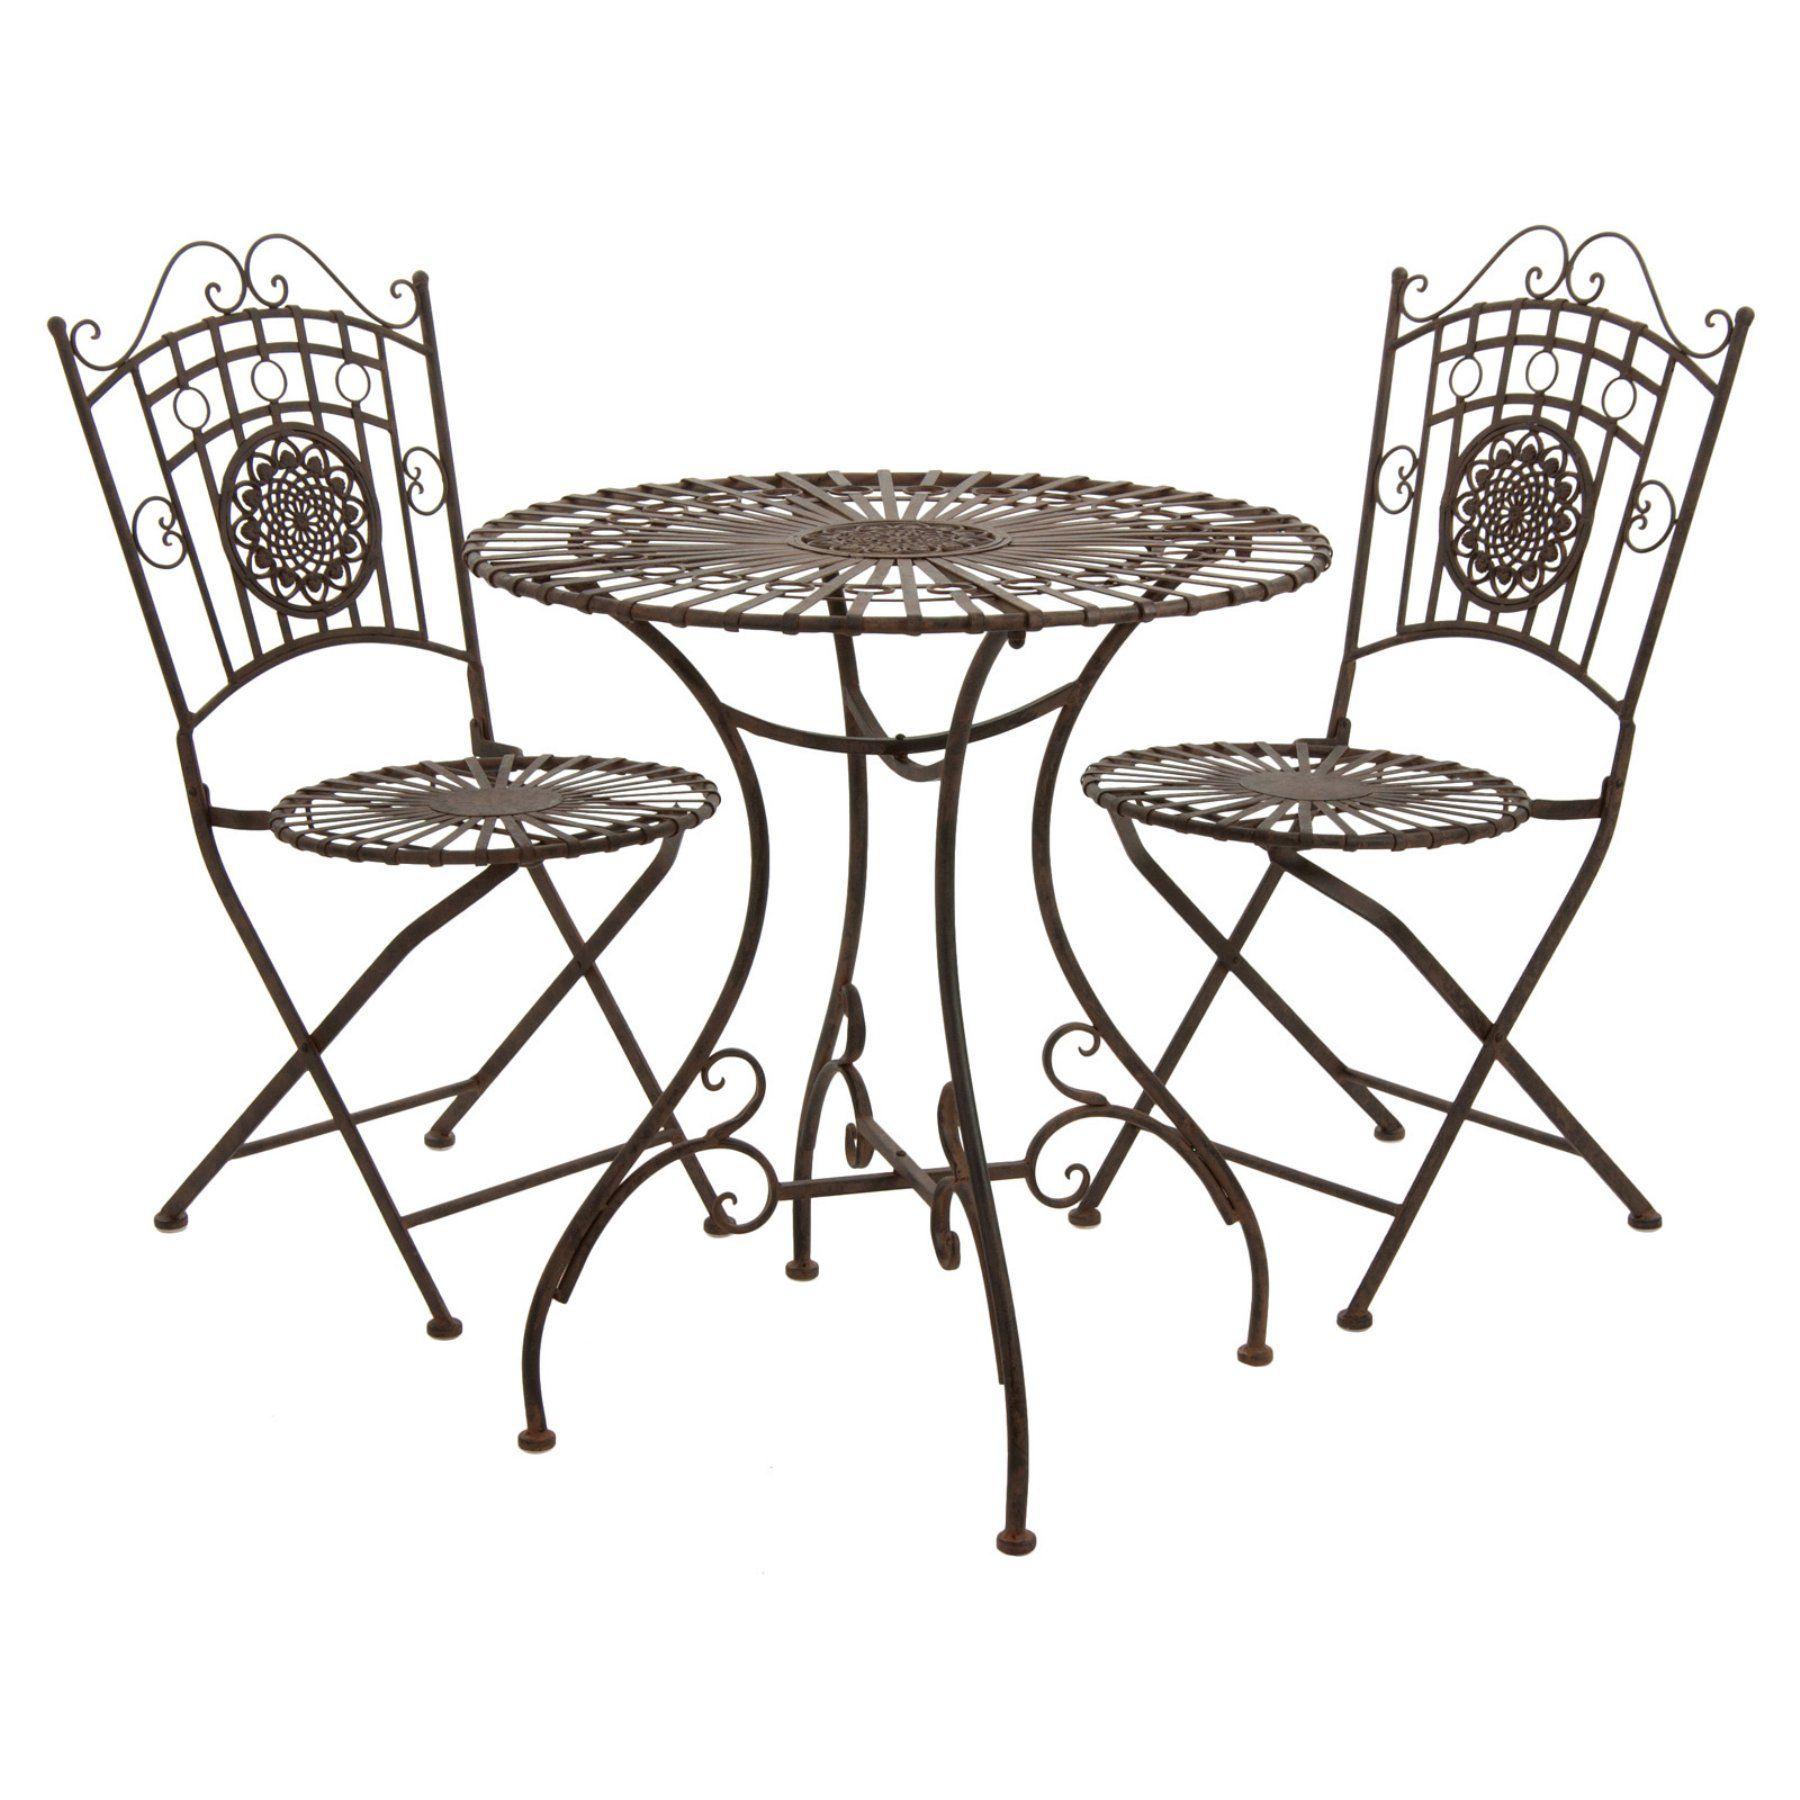 Outdoor Oriental Furniture Rustic Wrought Iron Patio Bistro Set - GF ...